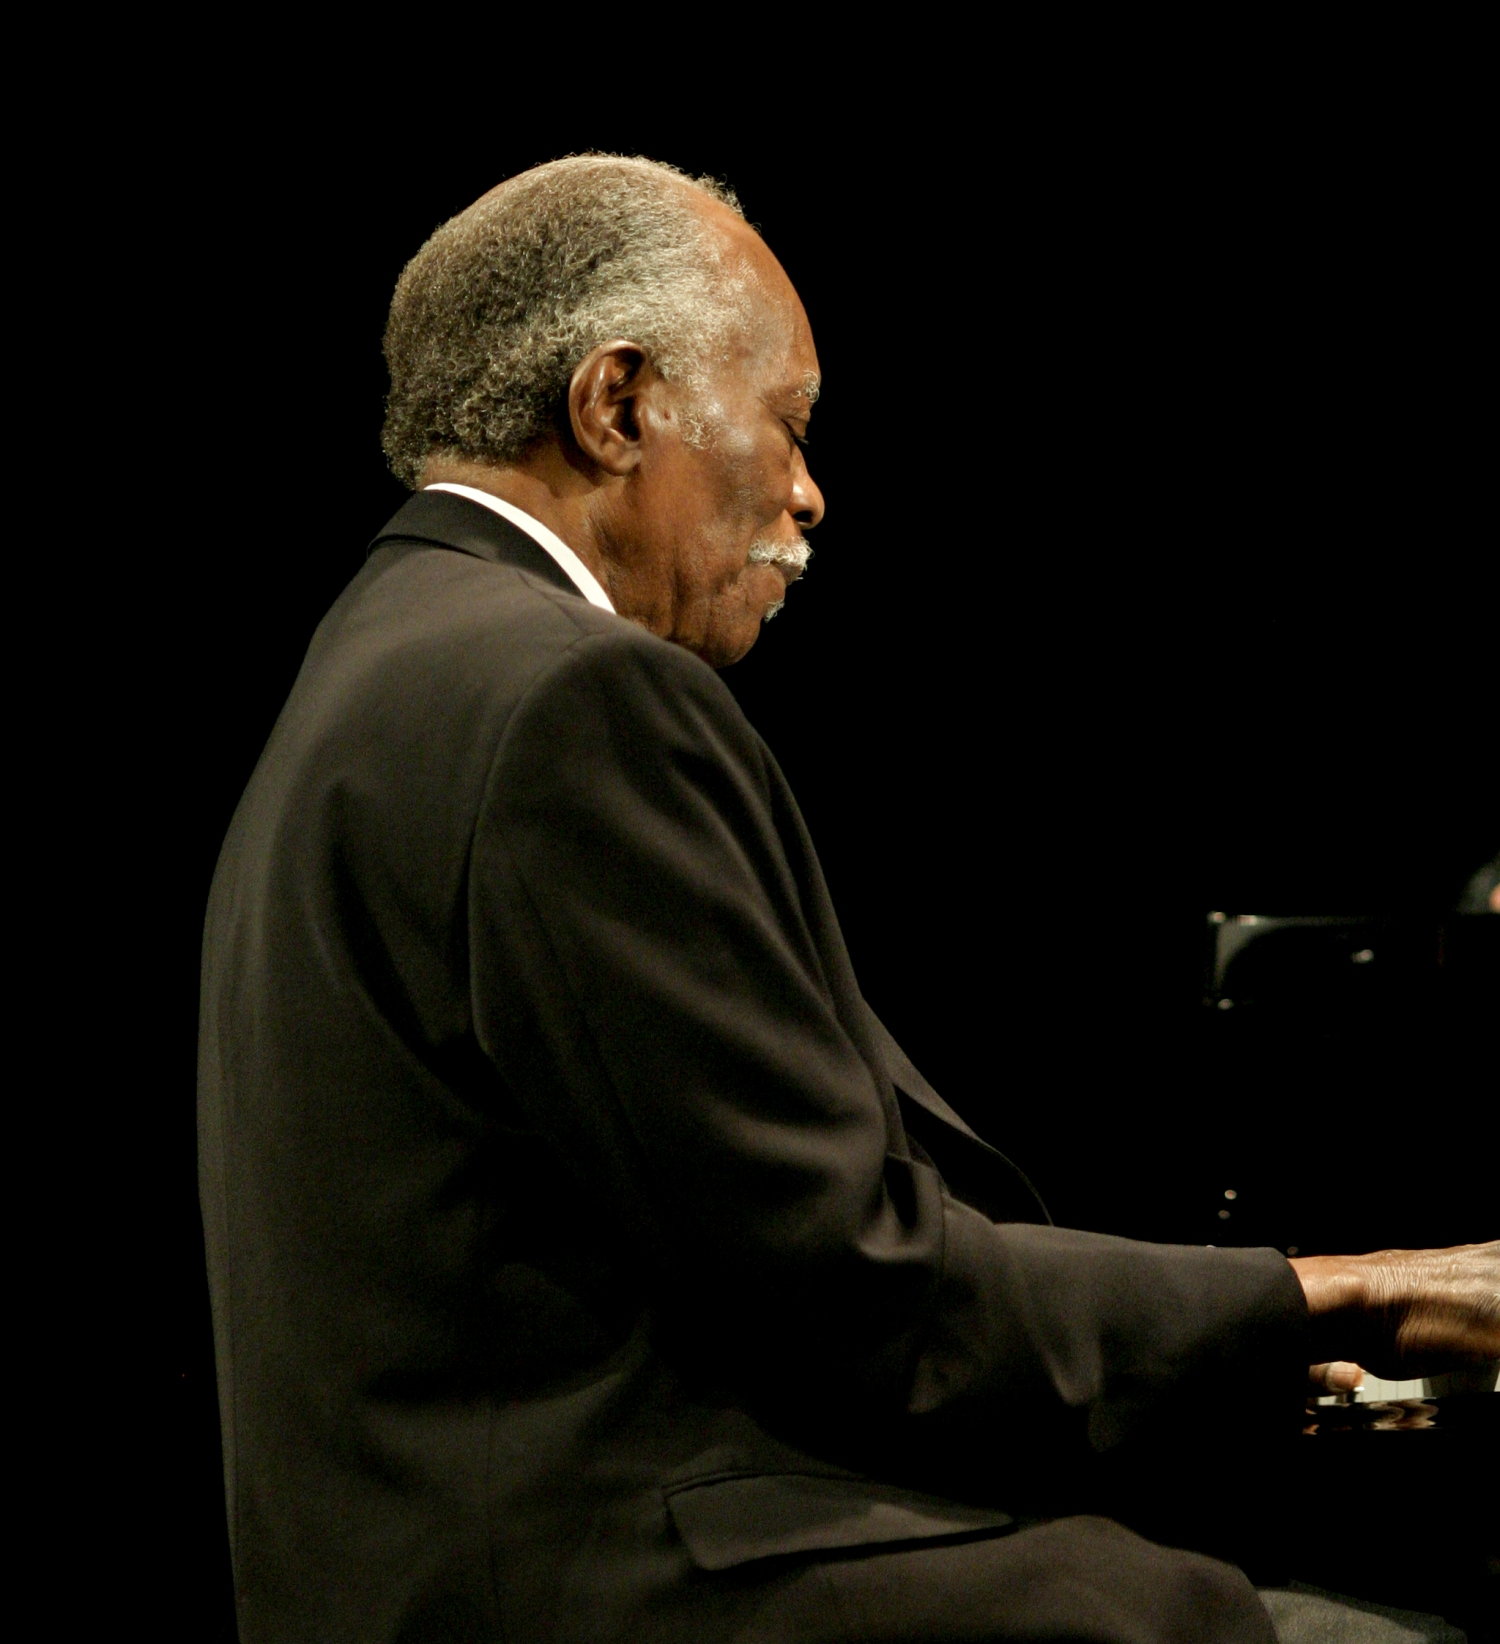 Hank Jones (Piano) on Copenhagen Jazz Festival 2005, Denmark